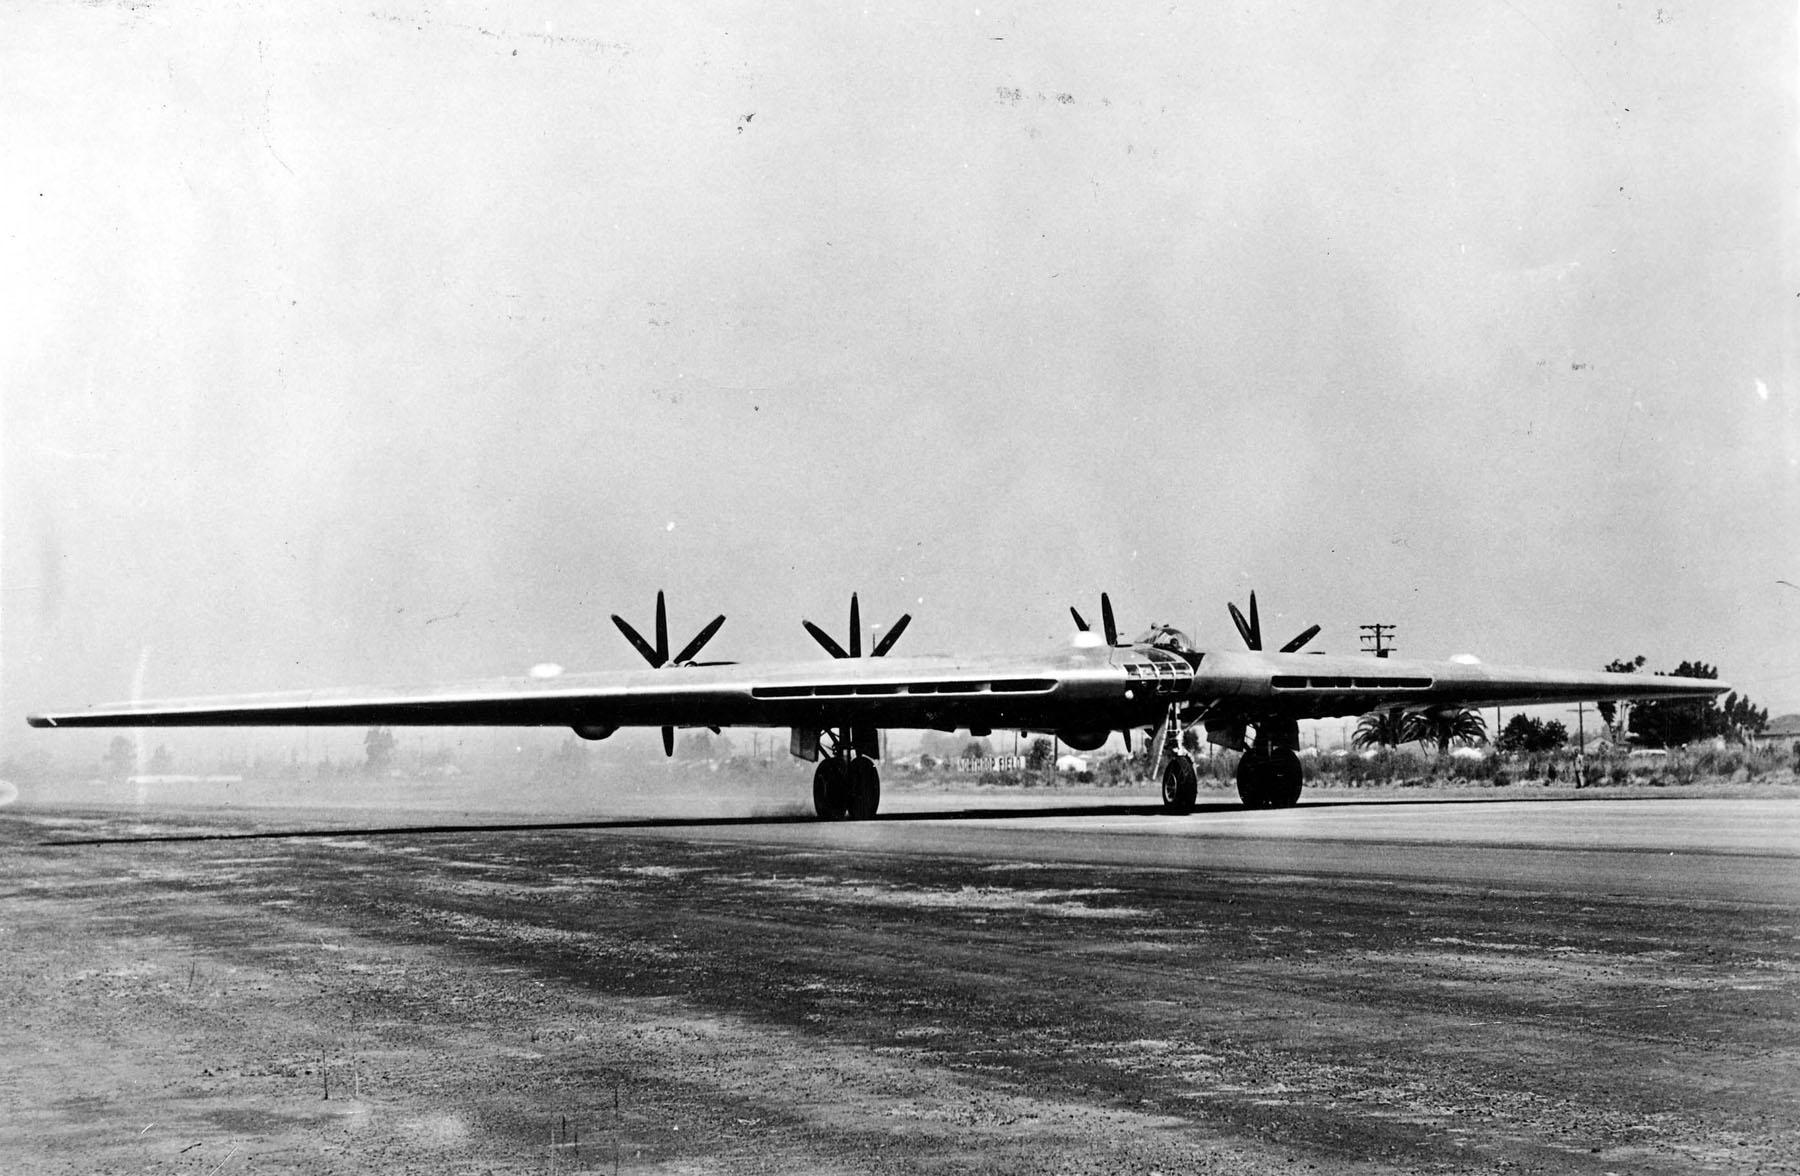 Northrop XB-35 taking off at Northrop Field, Hawthorne, California. (U.S. Air Force)